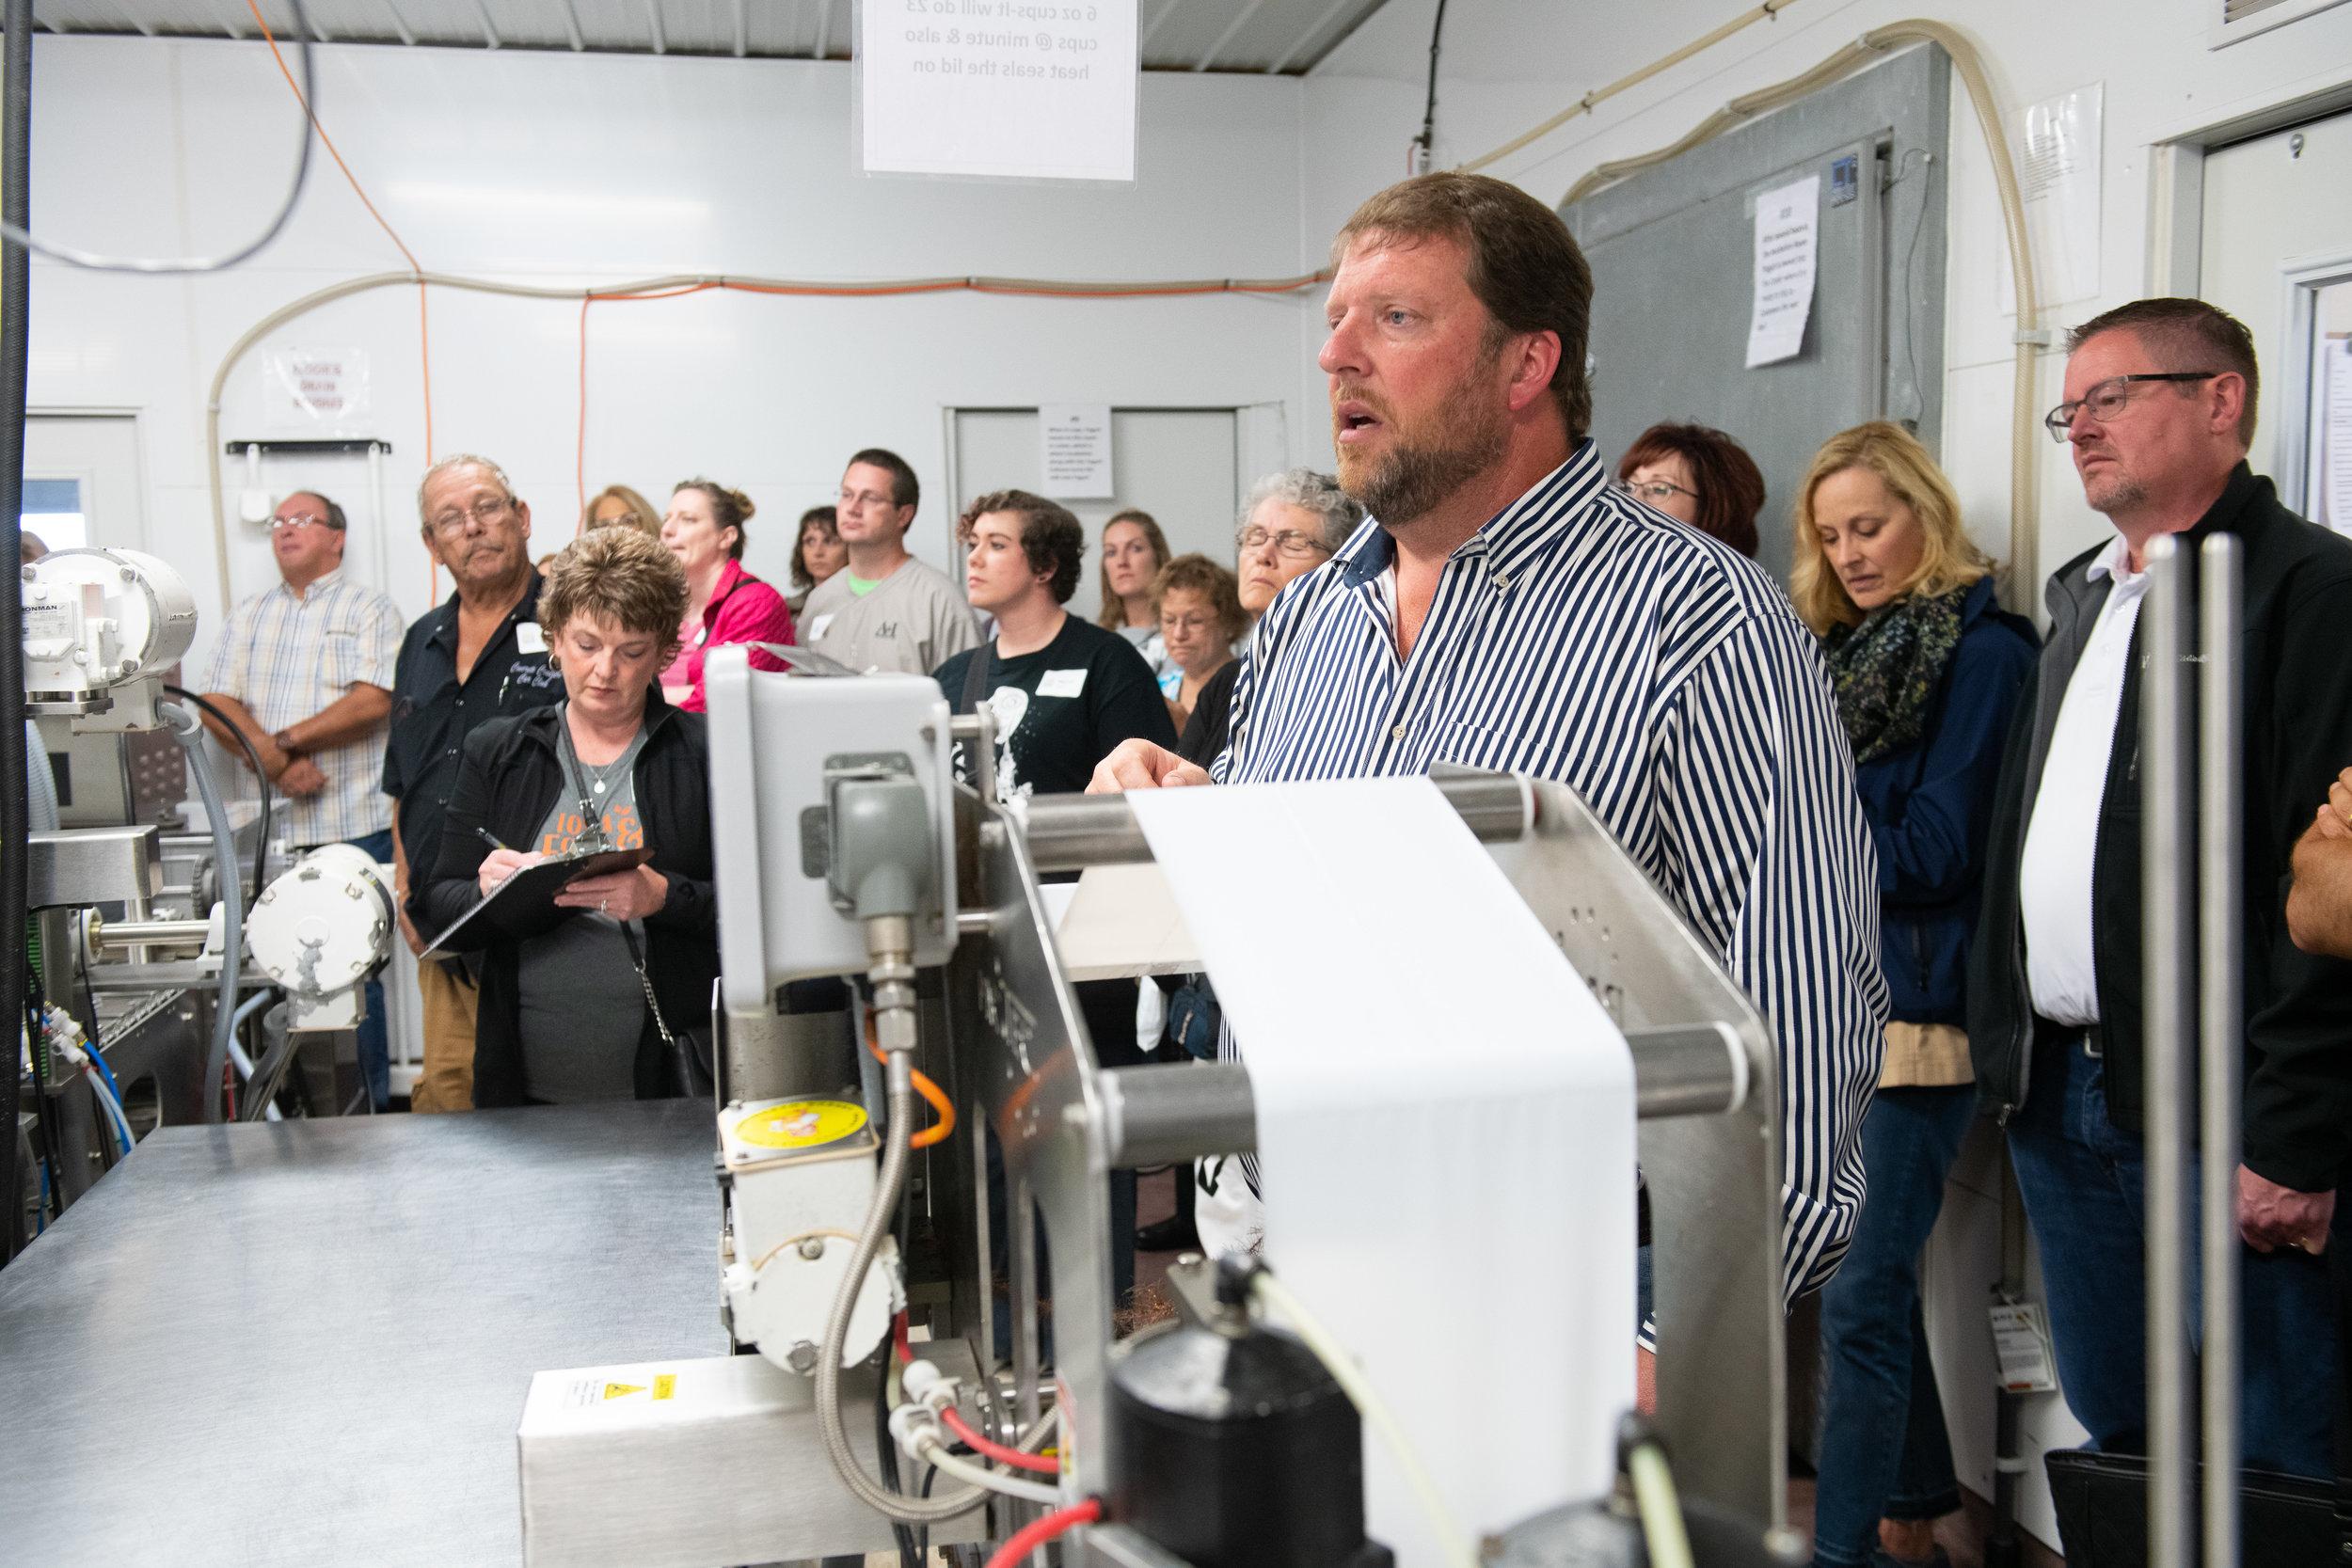 Dave Rapson explains the process of yogurt production at Country View Dairy. Photo credit: Joseph L. Murphy/Iowa Soybean Association